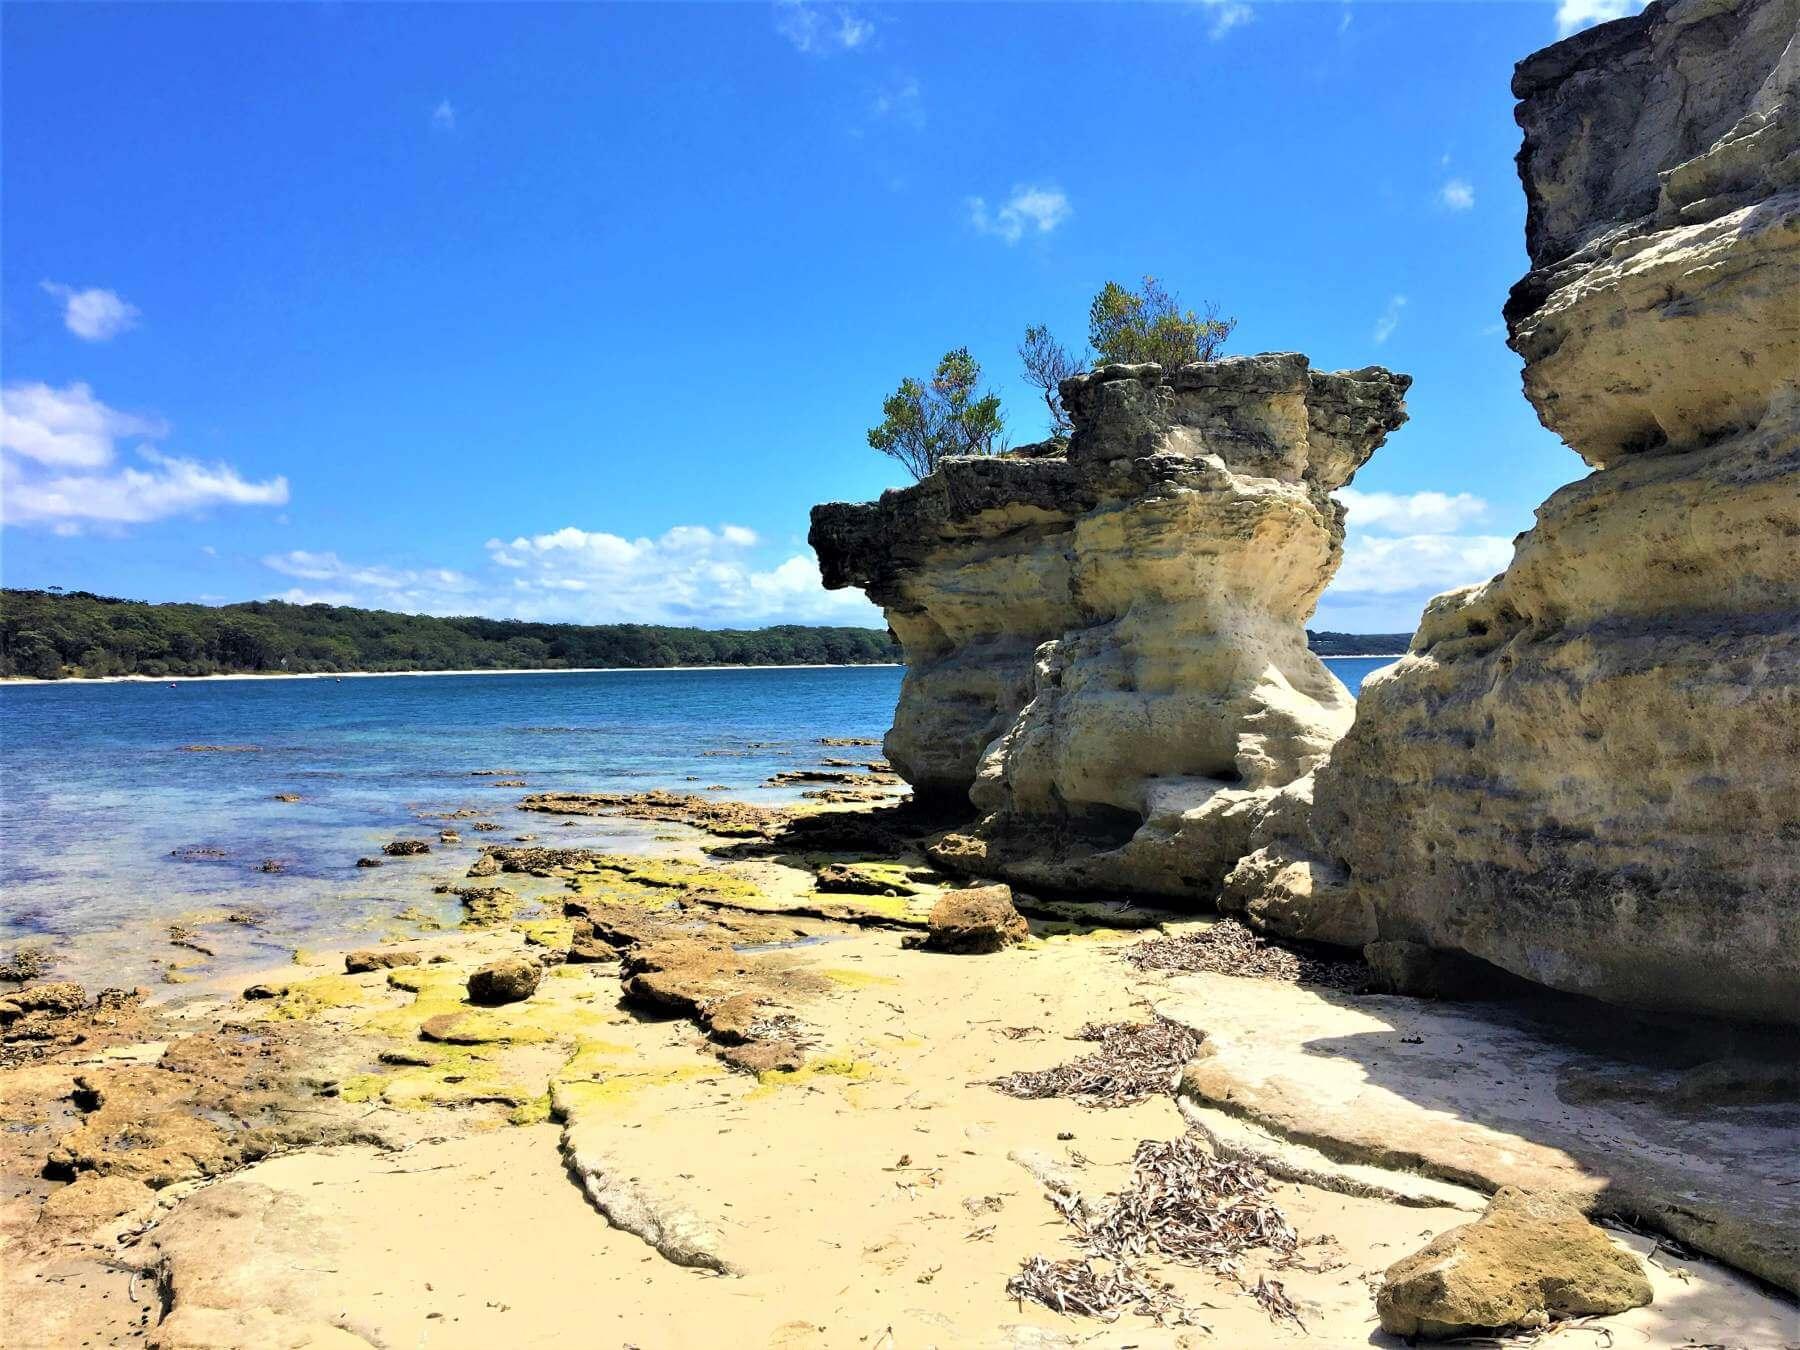 Felsen im Booderee National Park bei Jervis Bay